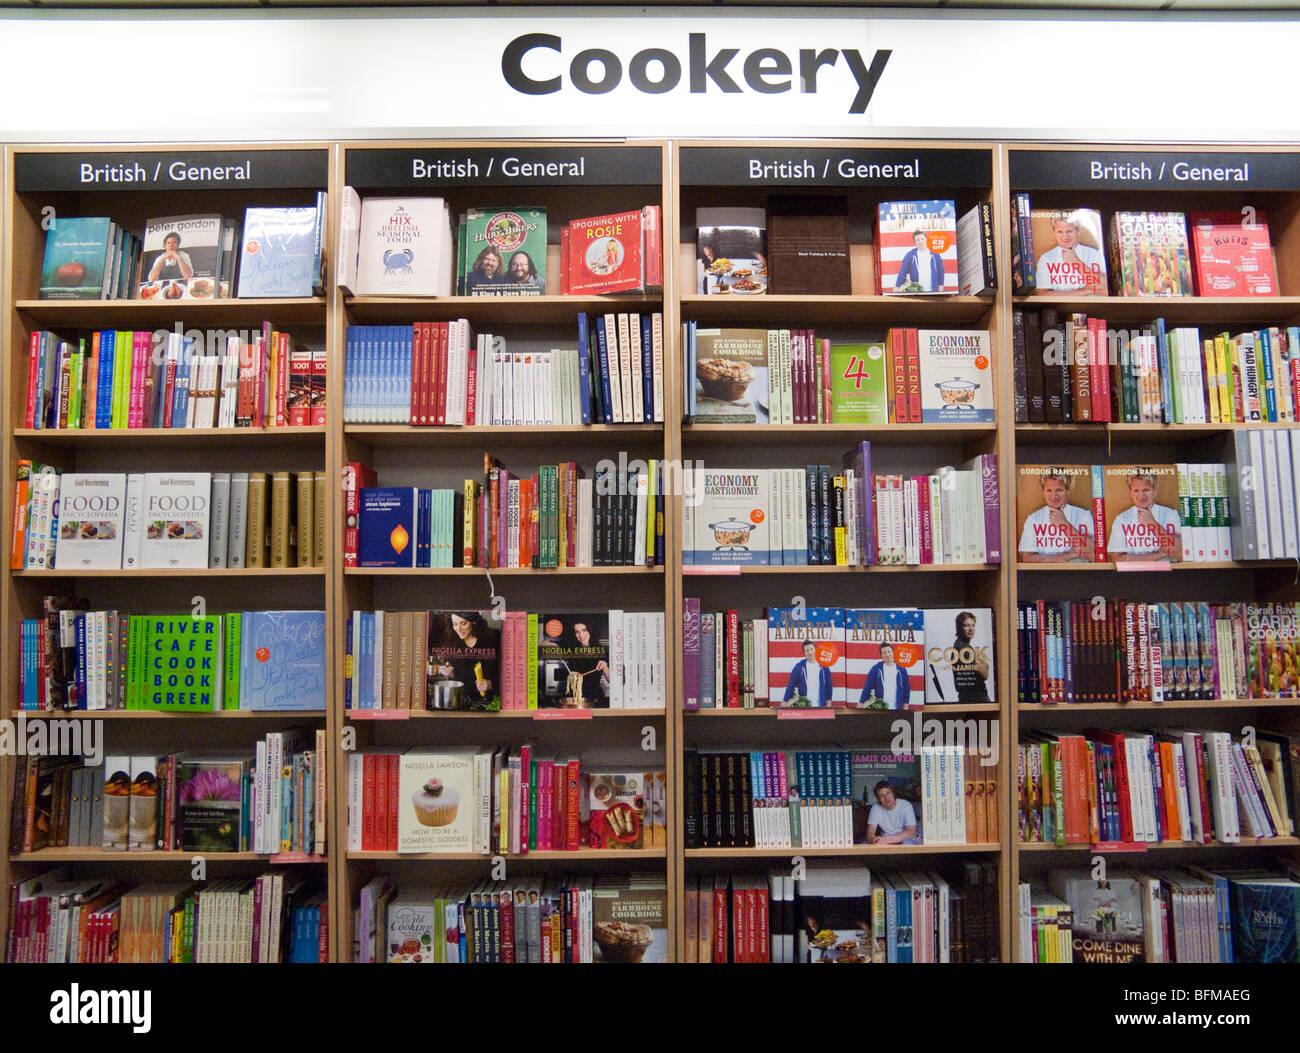 cookery books on shelves, Foyles bookshop, London, England, UK